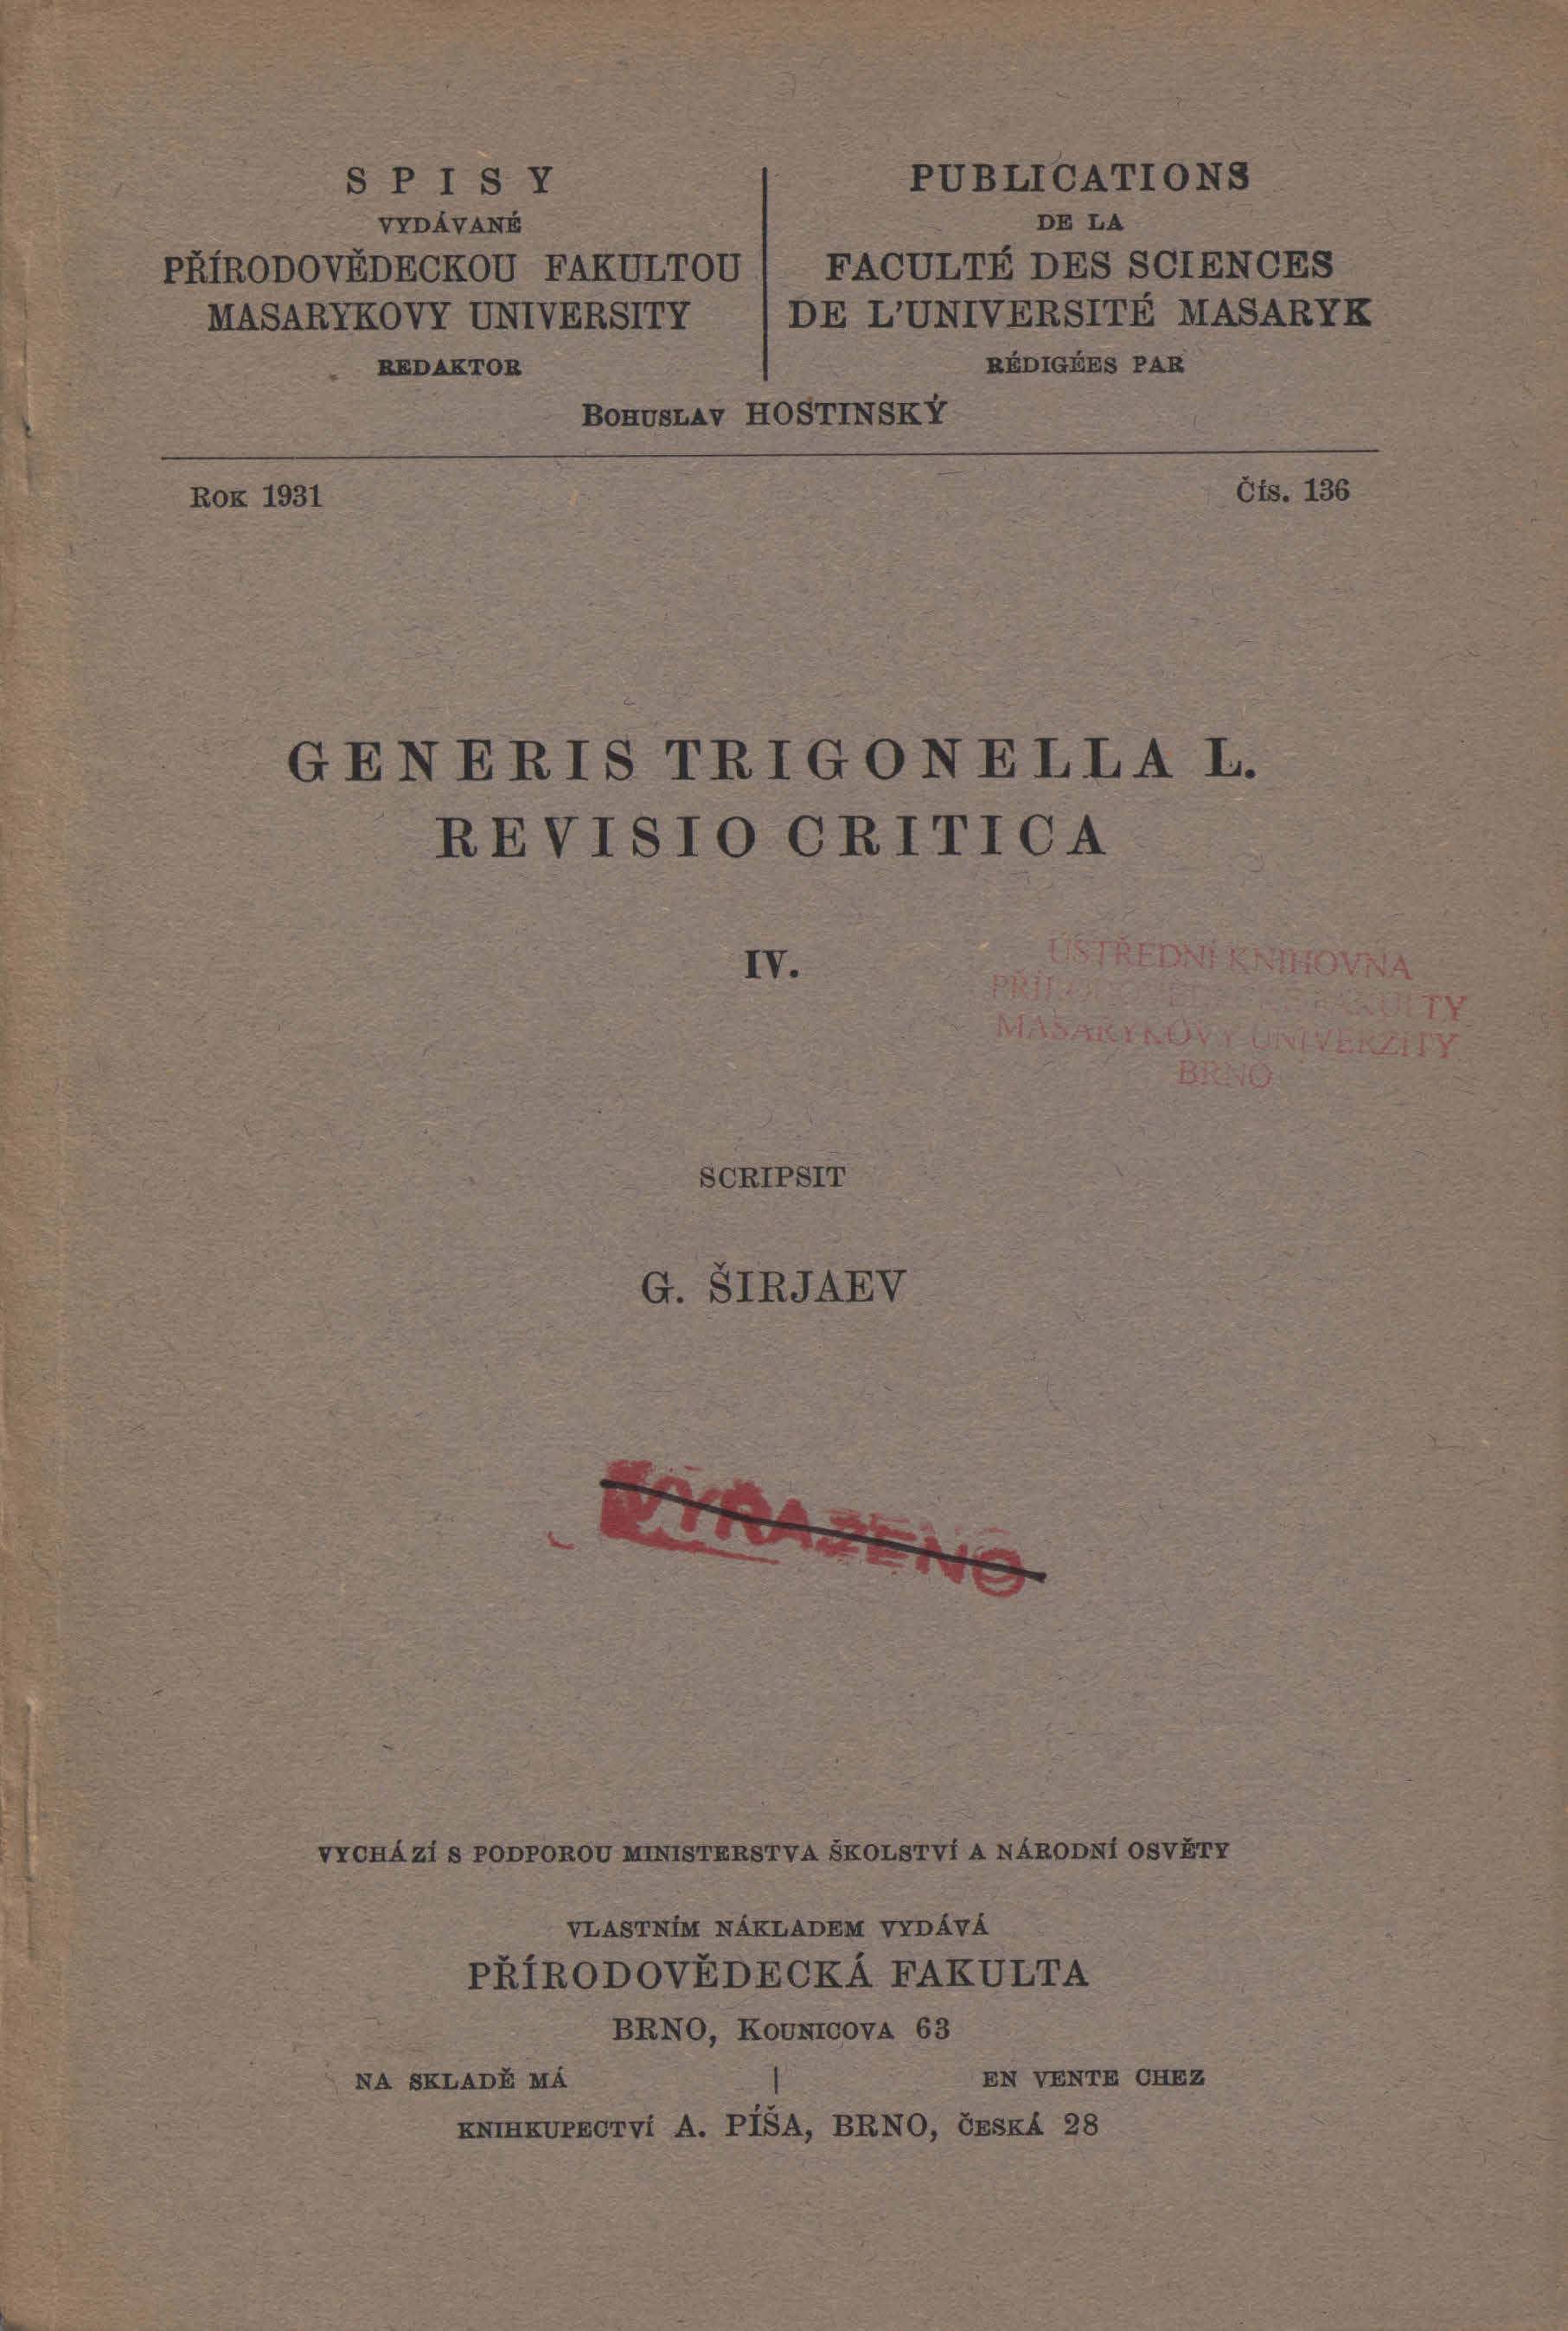 Obálka pro Generis Trigonella L. revisio critica. IV.